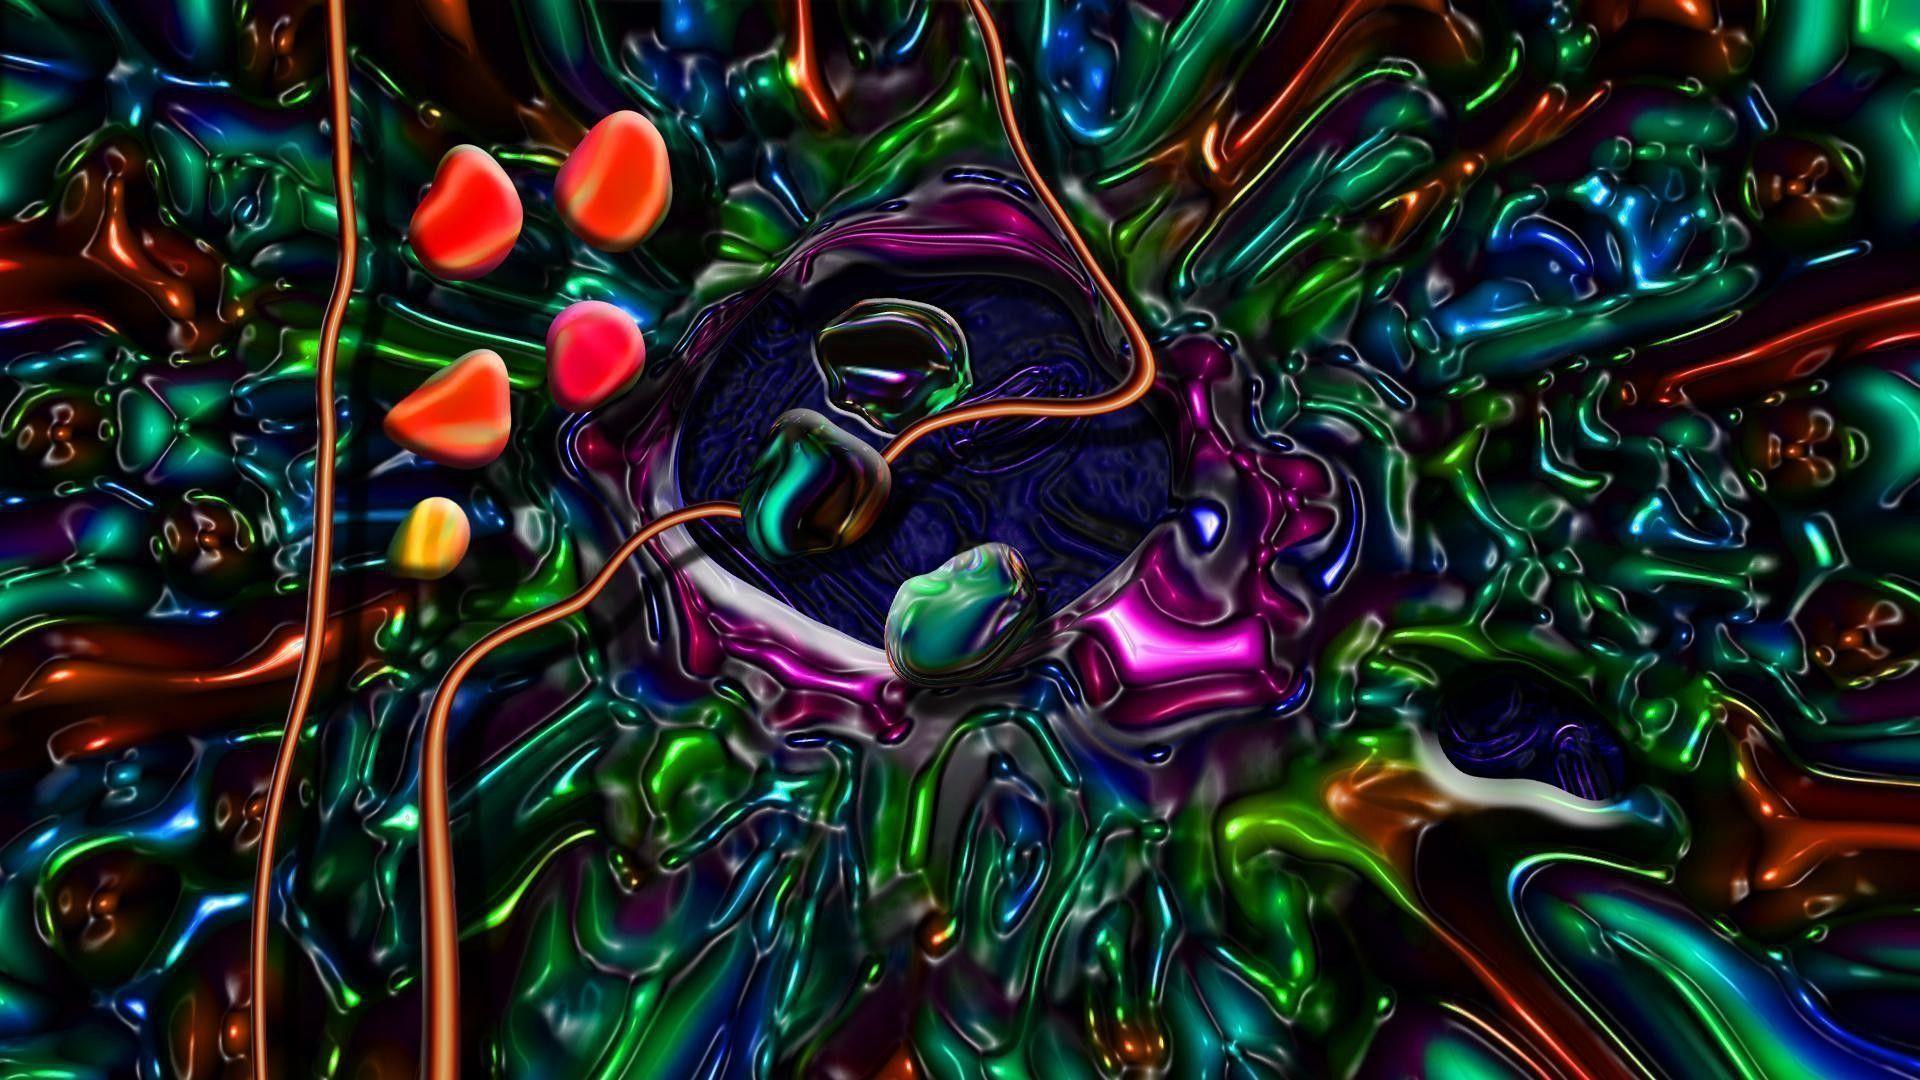 Trippy Space Background Wallpaper HD Resolution – dlwallhd.